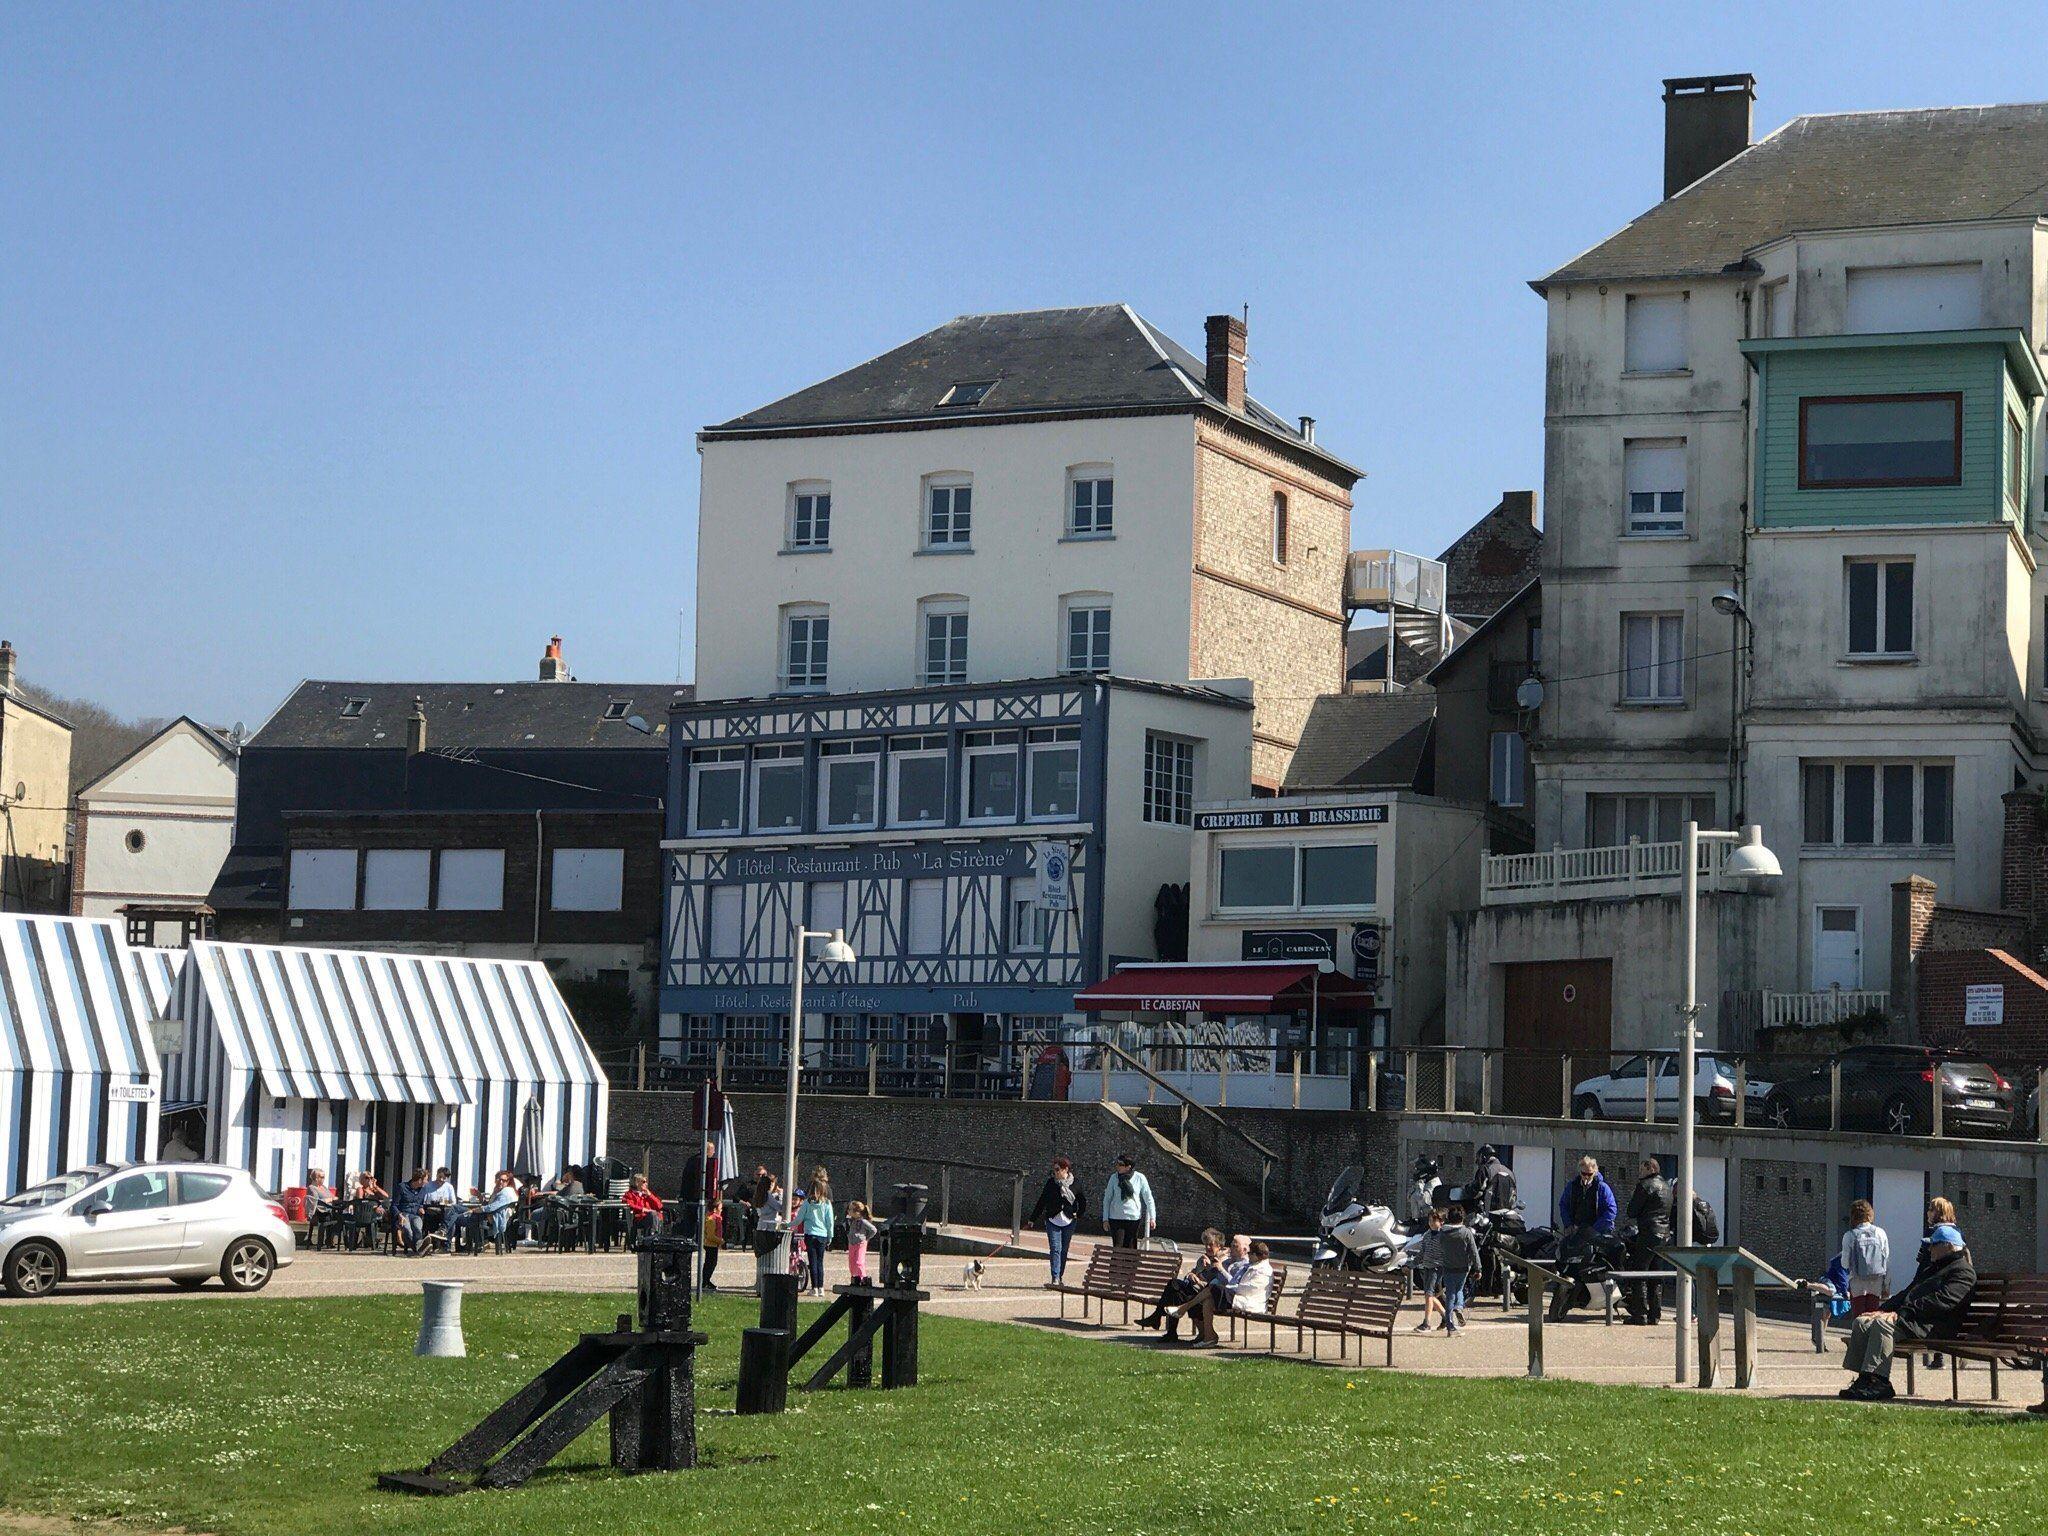 Ant Martina Franca hotel restaurant pub la sirene (yport, france) - reviews